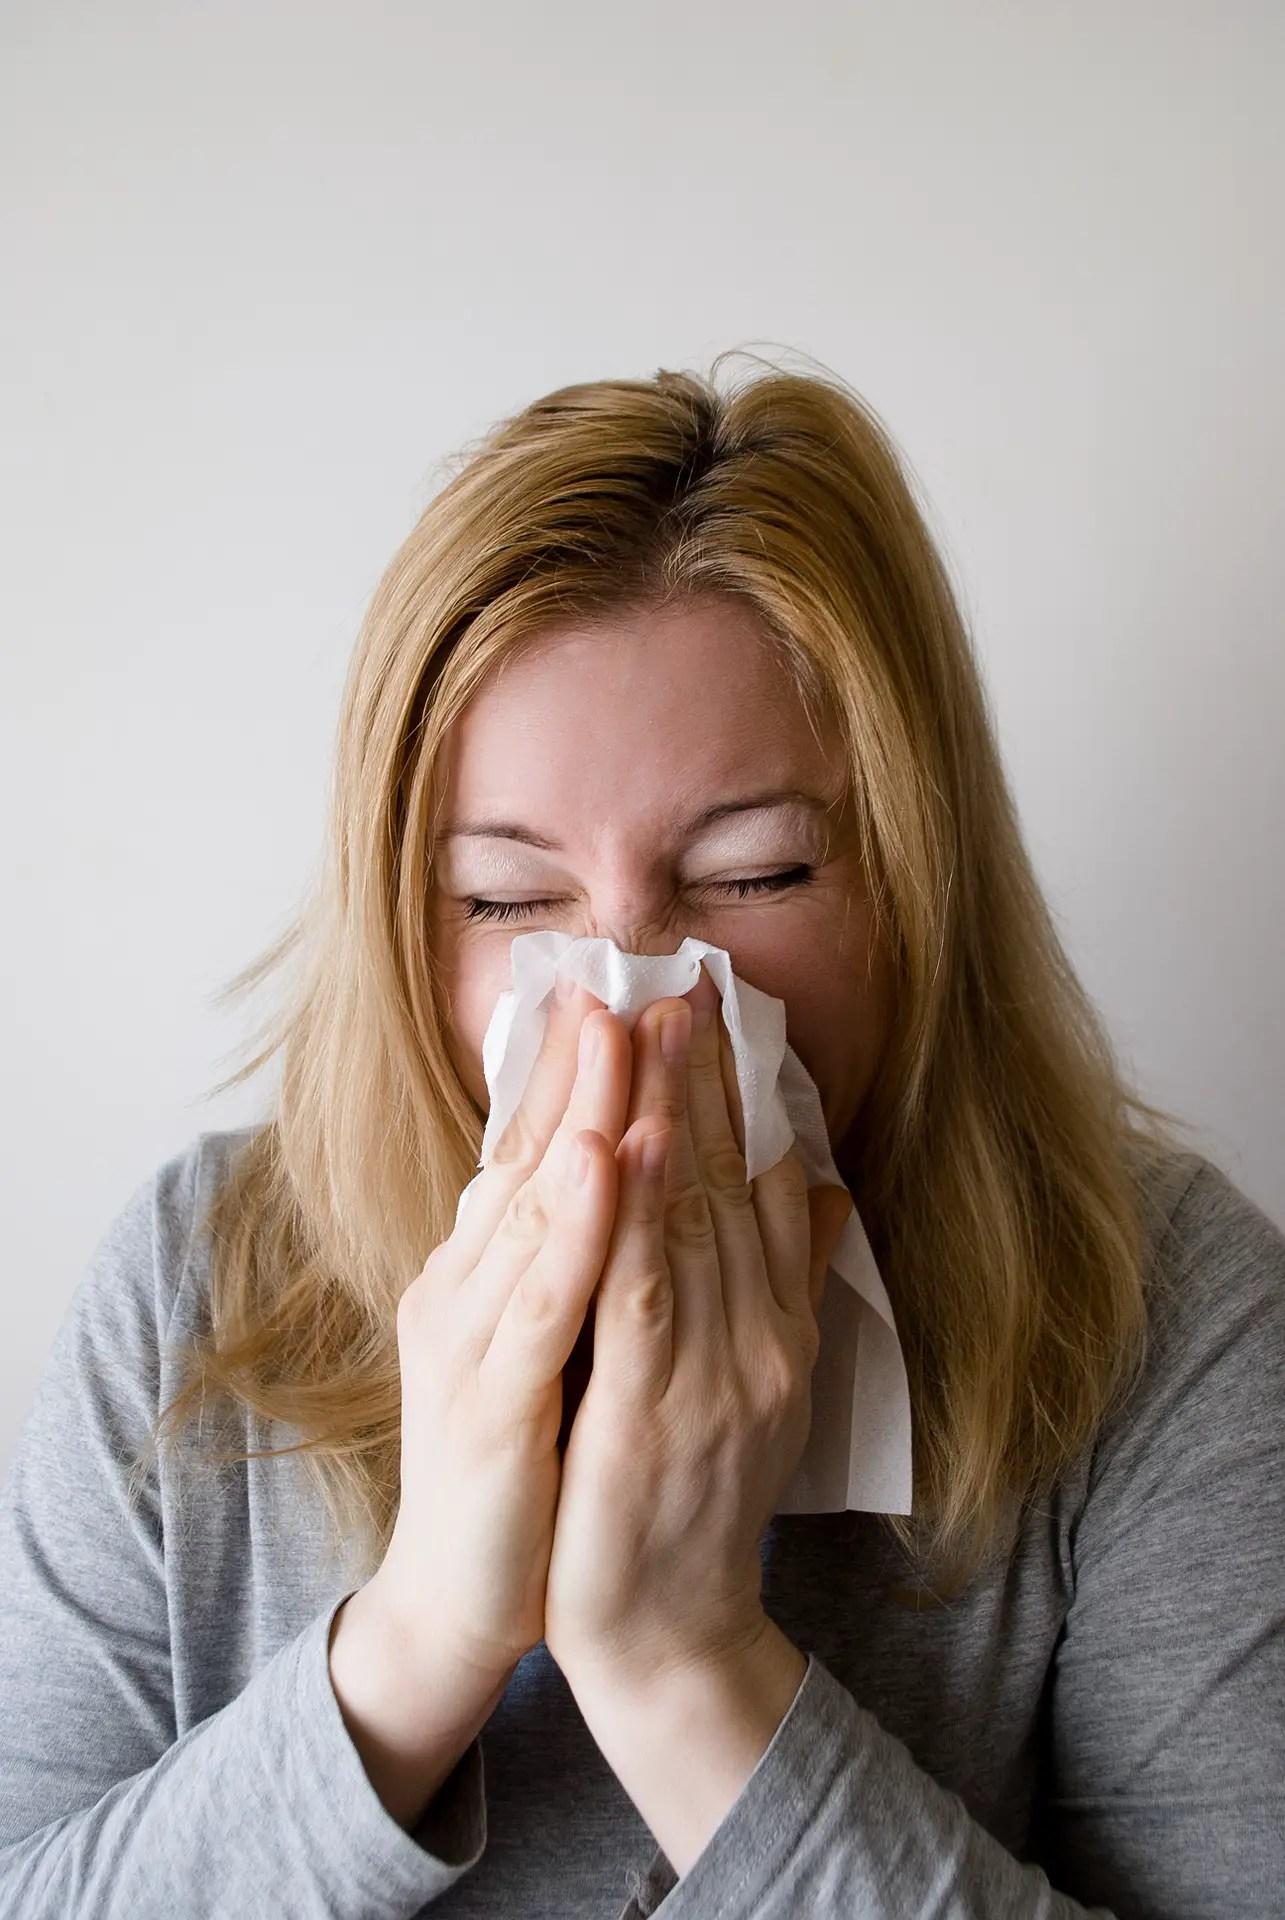 Deadly Flu Virus Creation